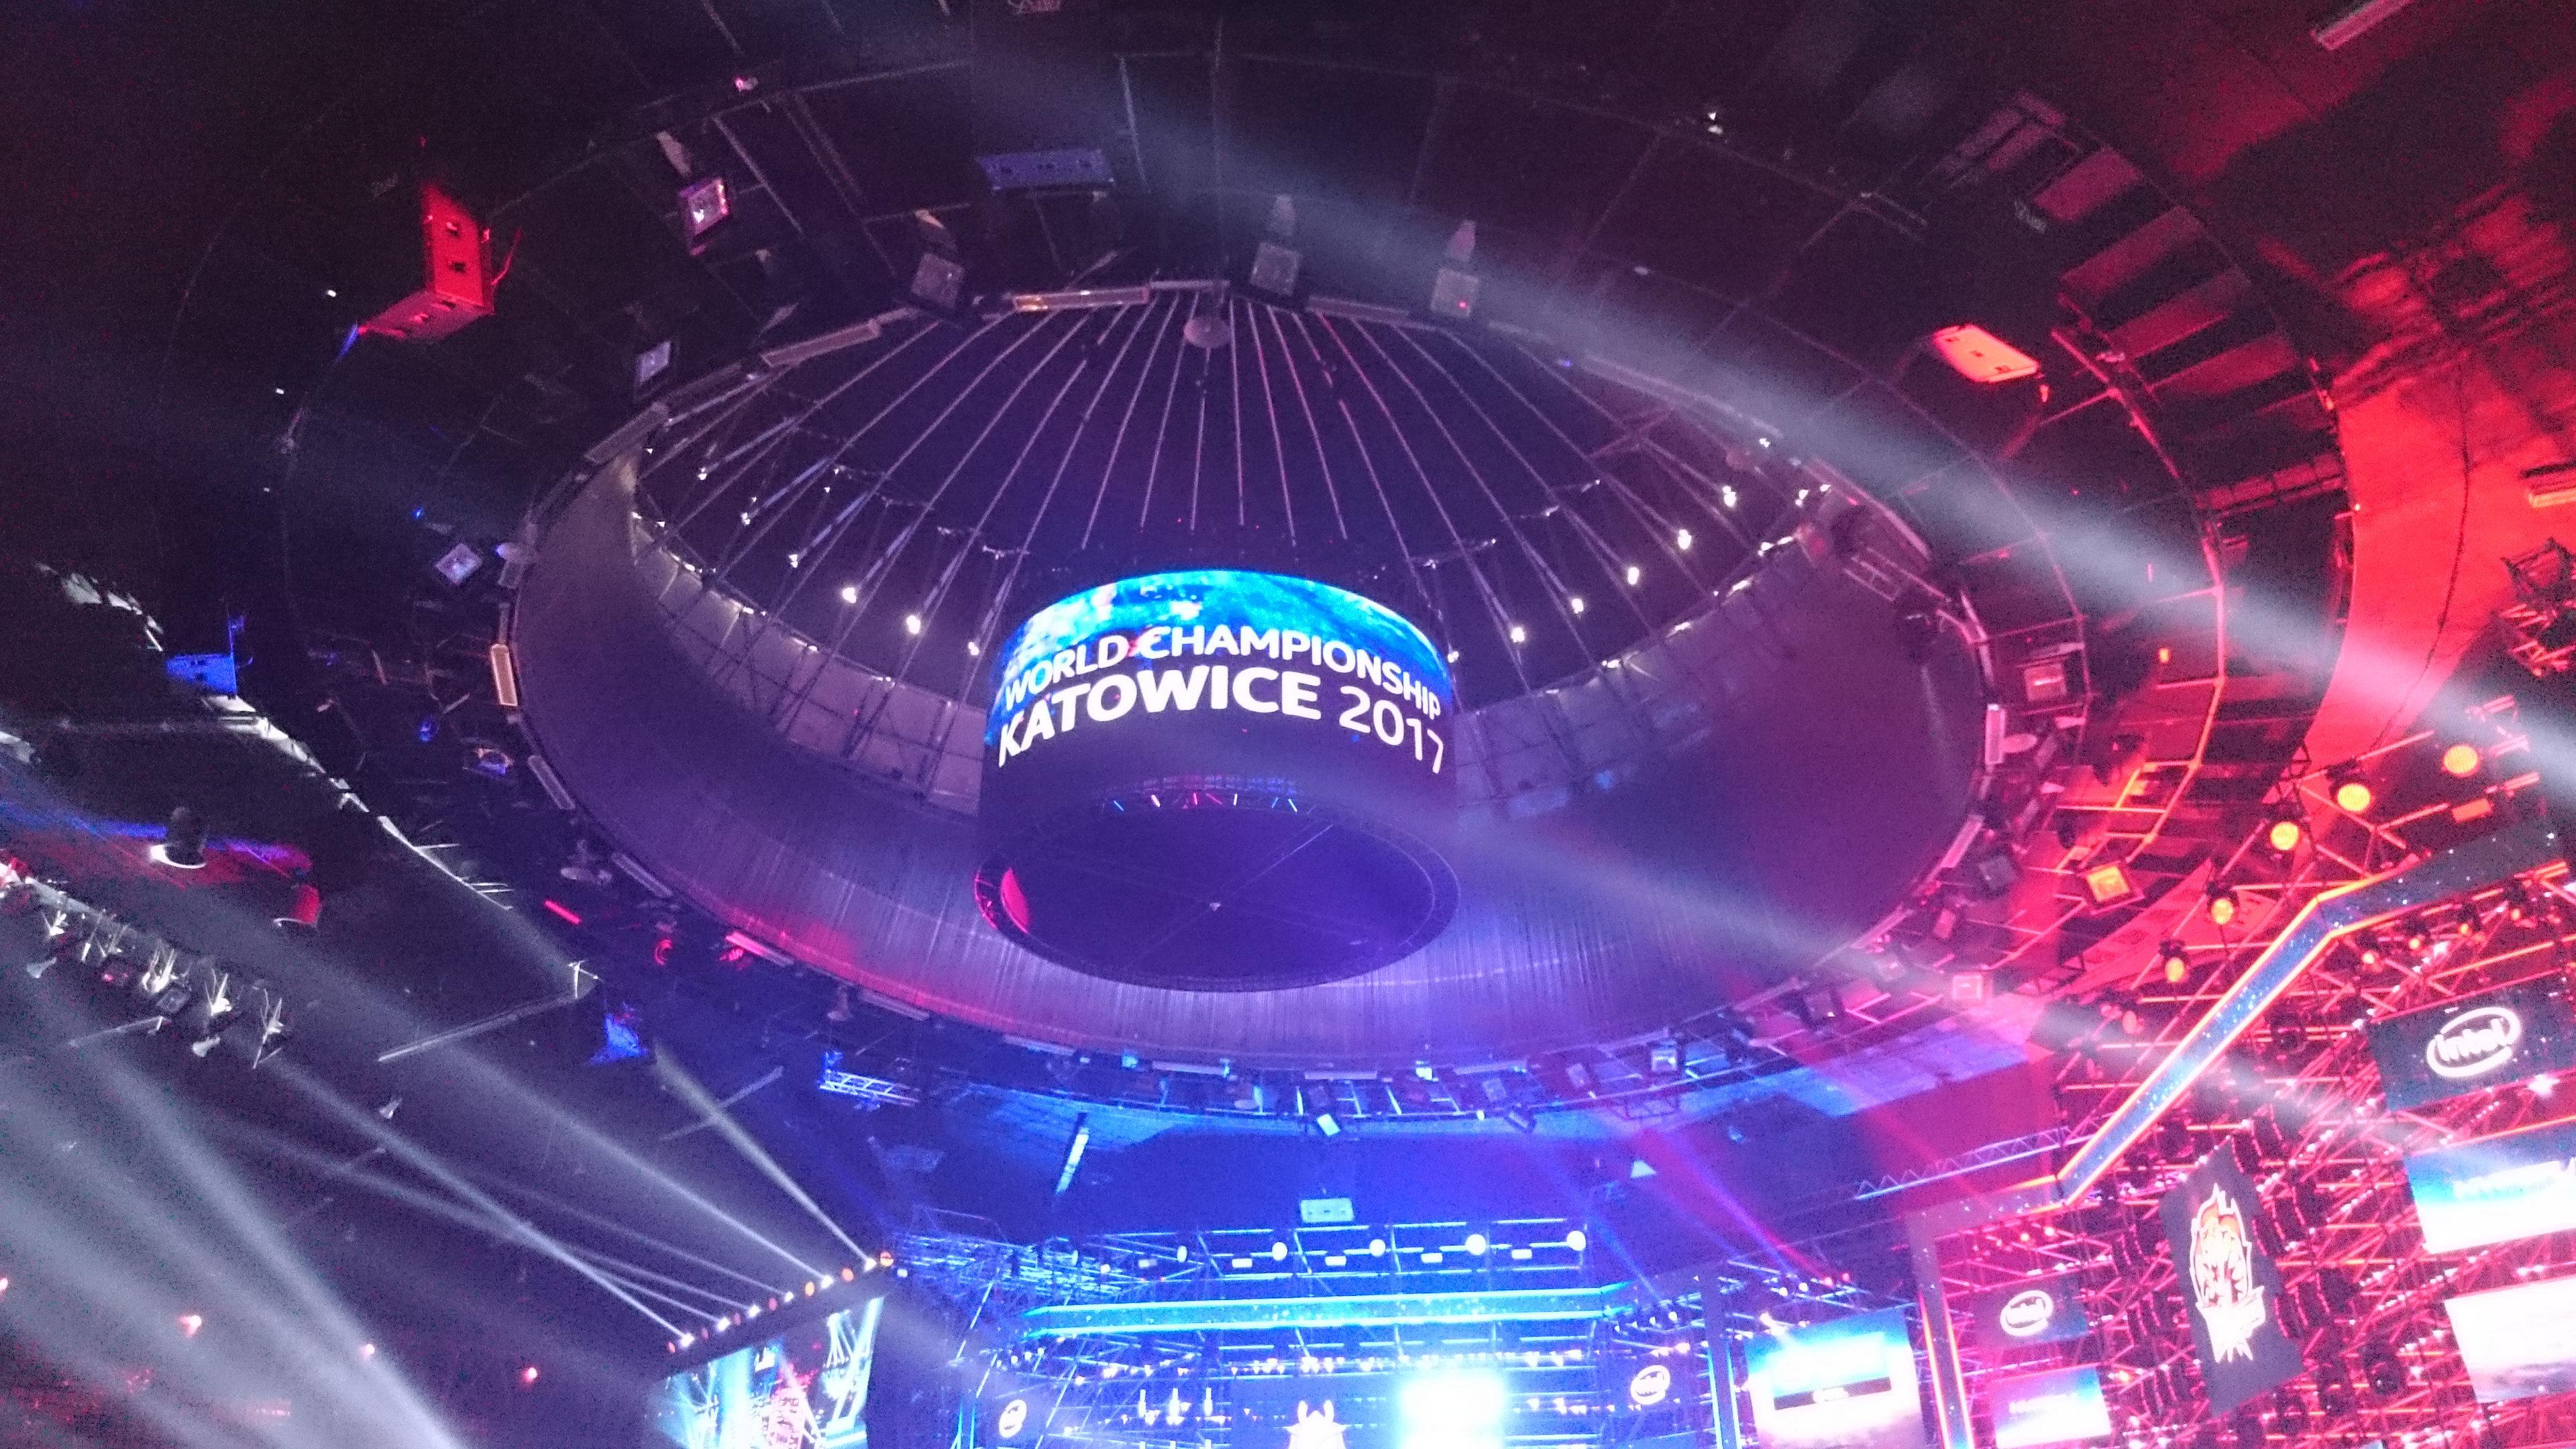 Intel Extreme Masters Worlds Championships 2017 w Katowicach